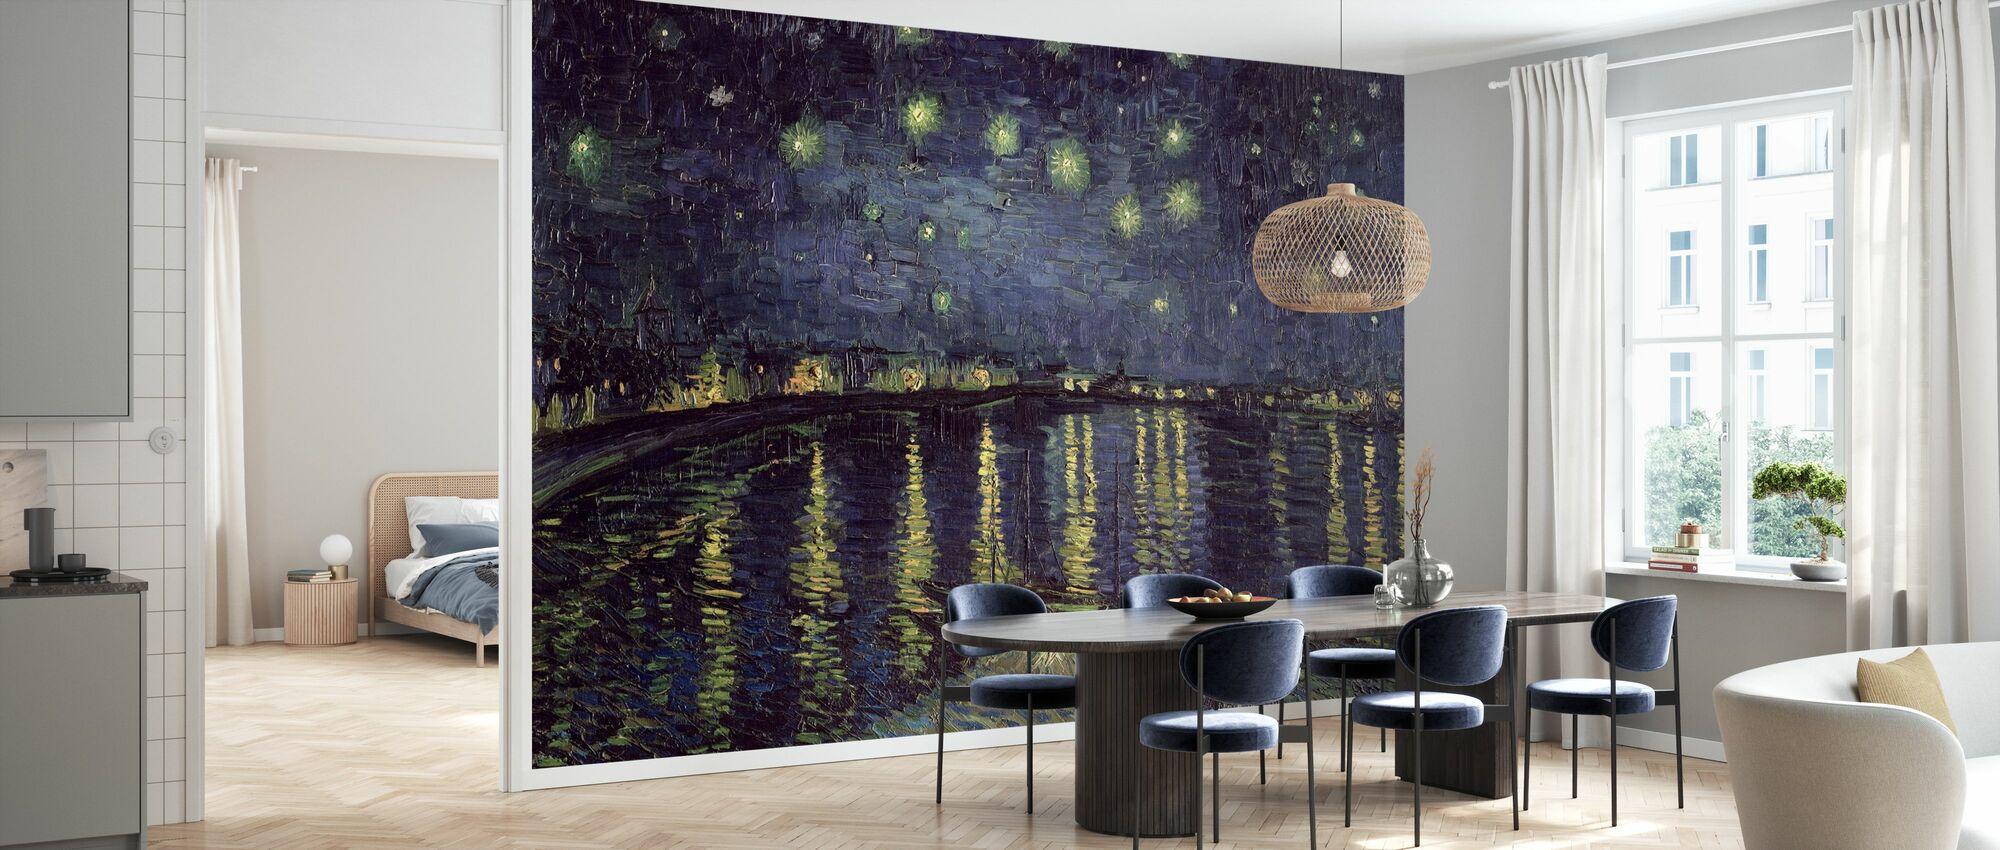 Starry Night - Vincent van Gogh - Wallpaper - Kitchen